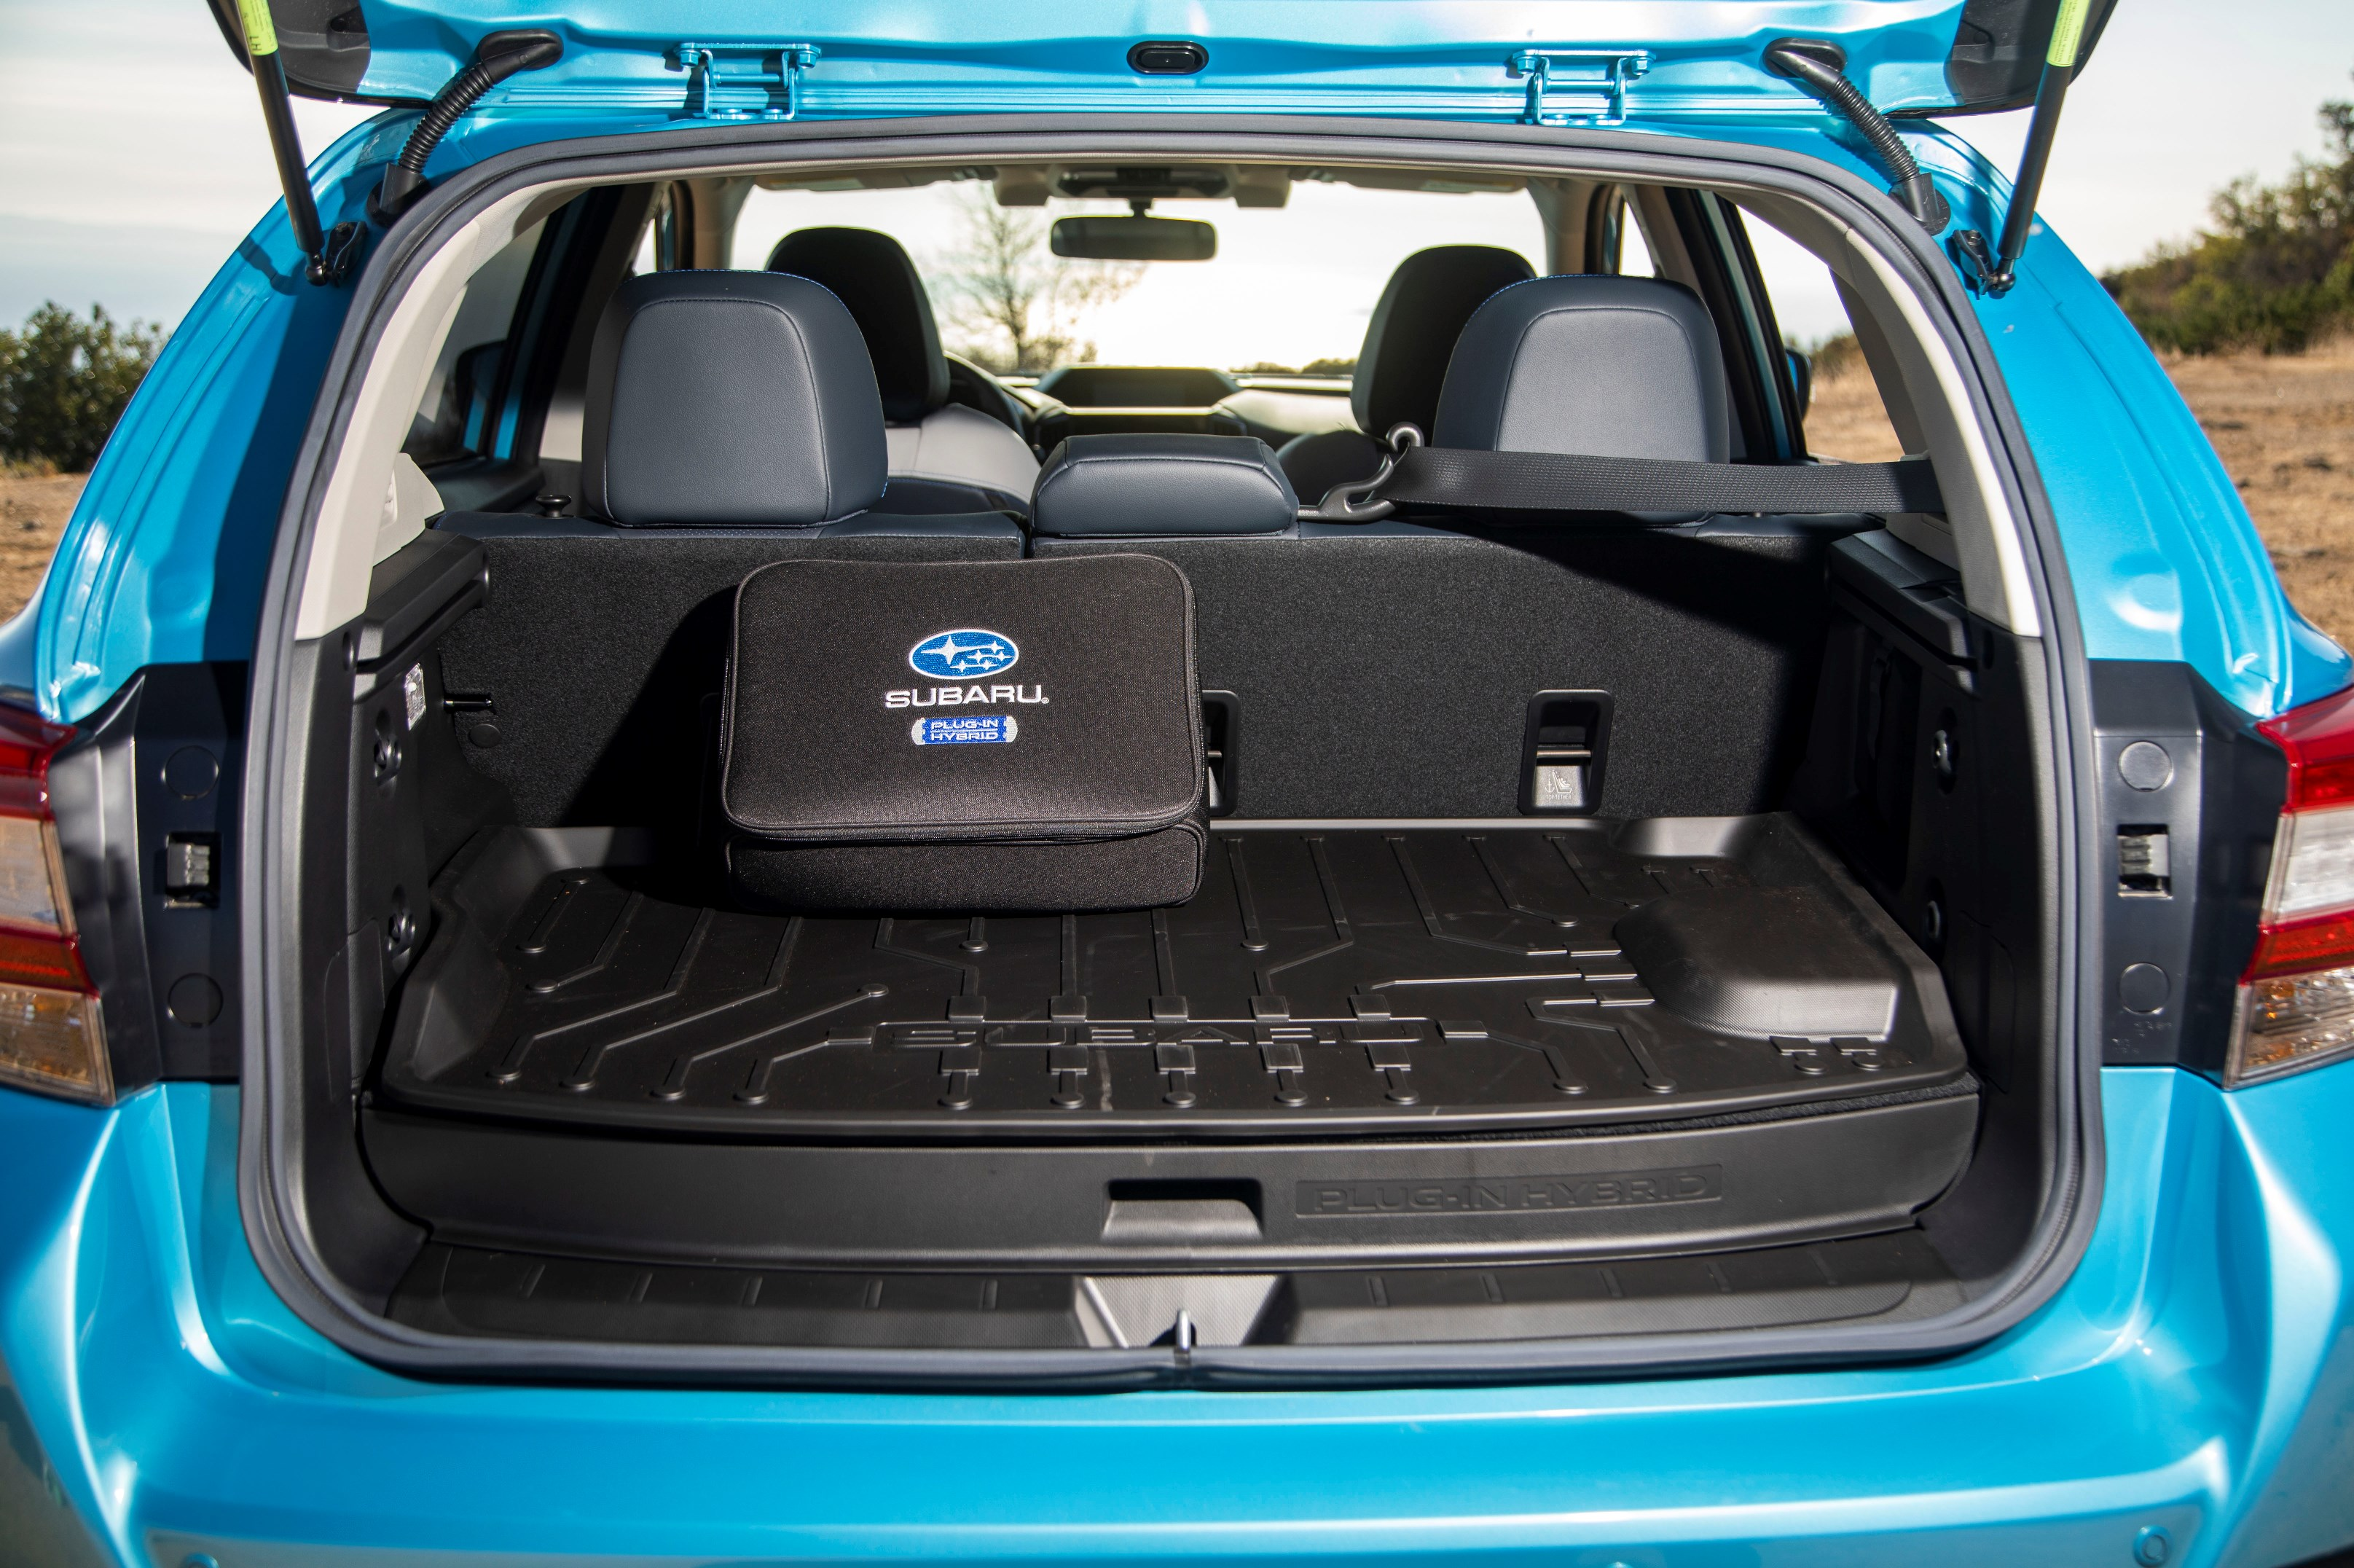 2021 Subaru Crosstrek Expected With FB25 Boxer Engine ...